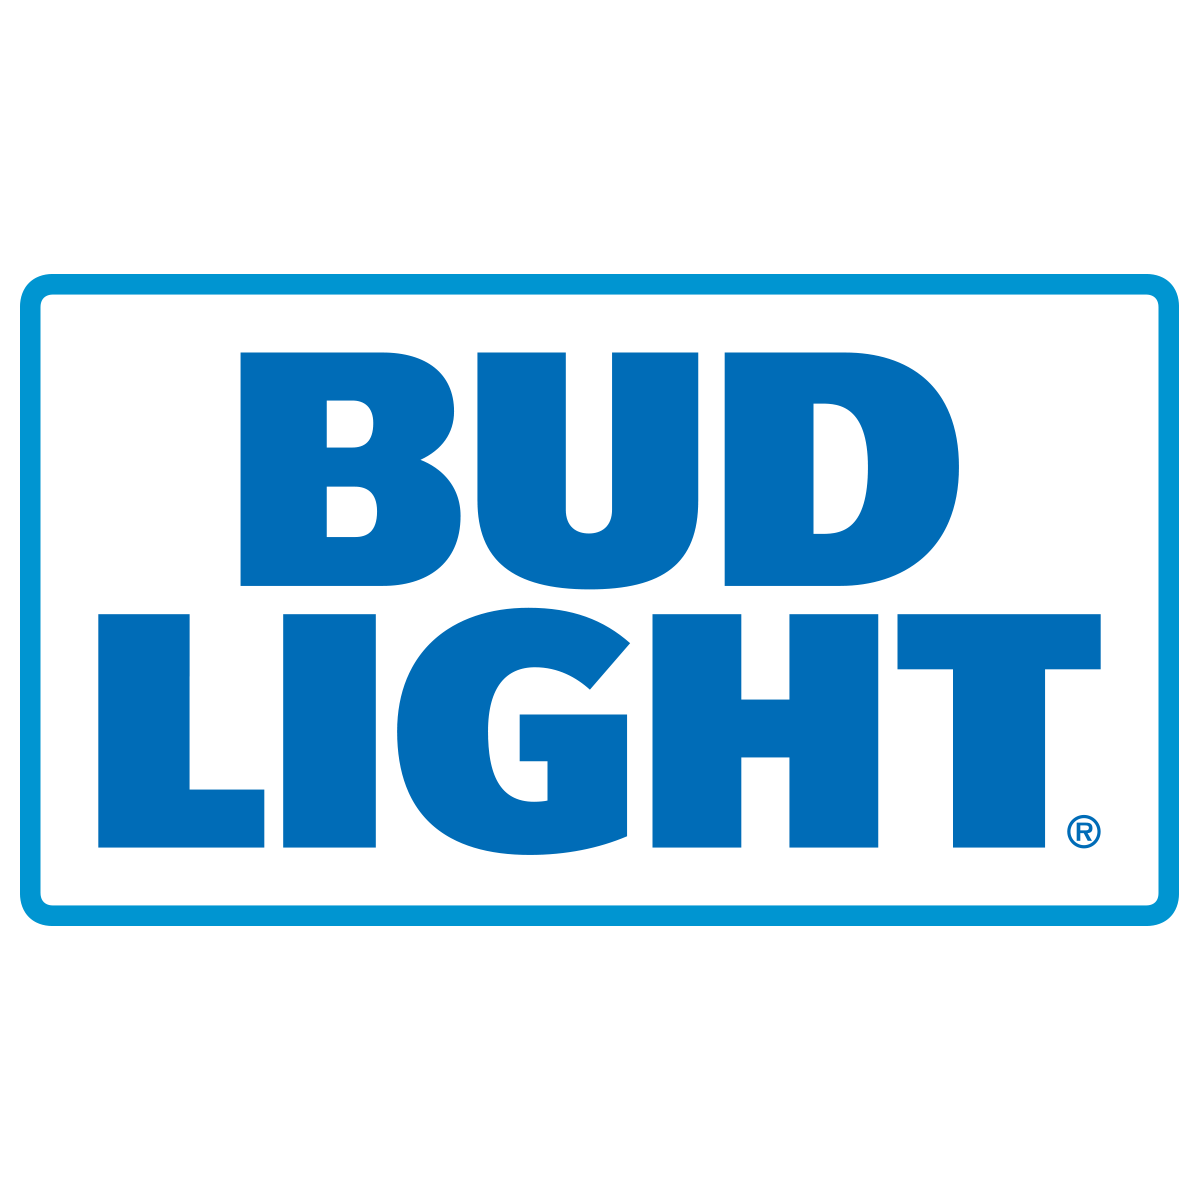 BudLightLogo-1505850998.png